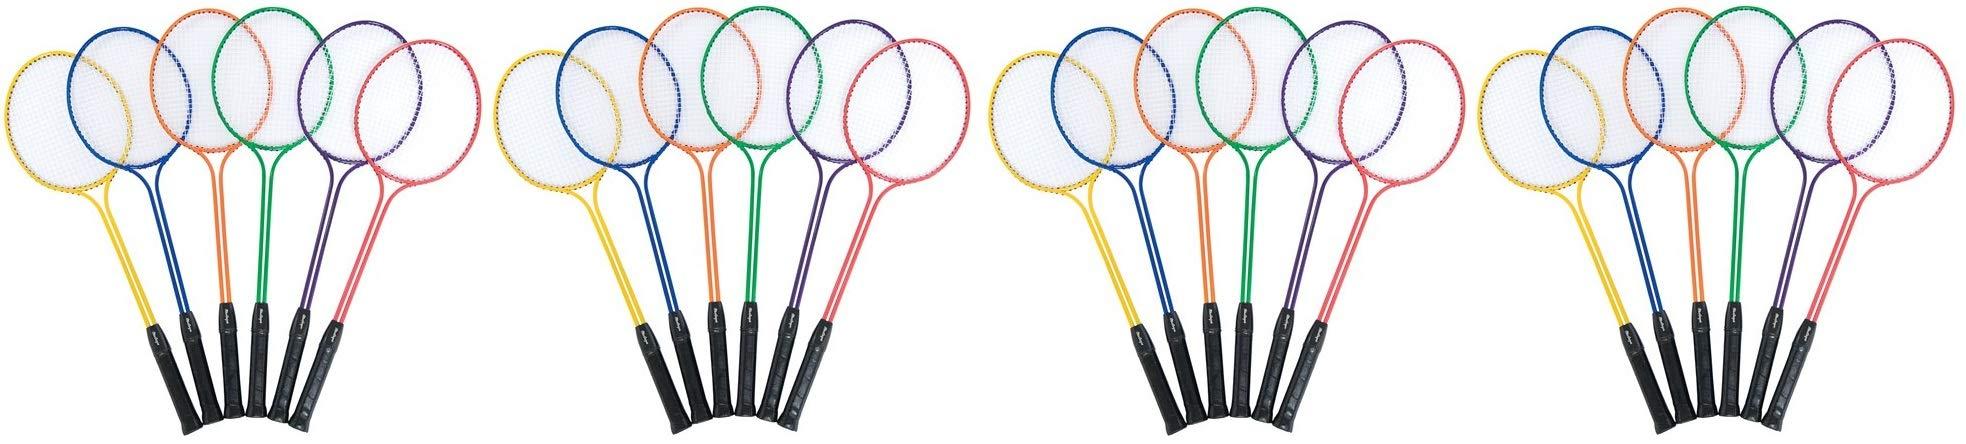 BSN Badminton Racquet (Prism Pack) (Fоur Расk)